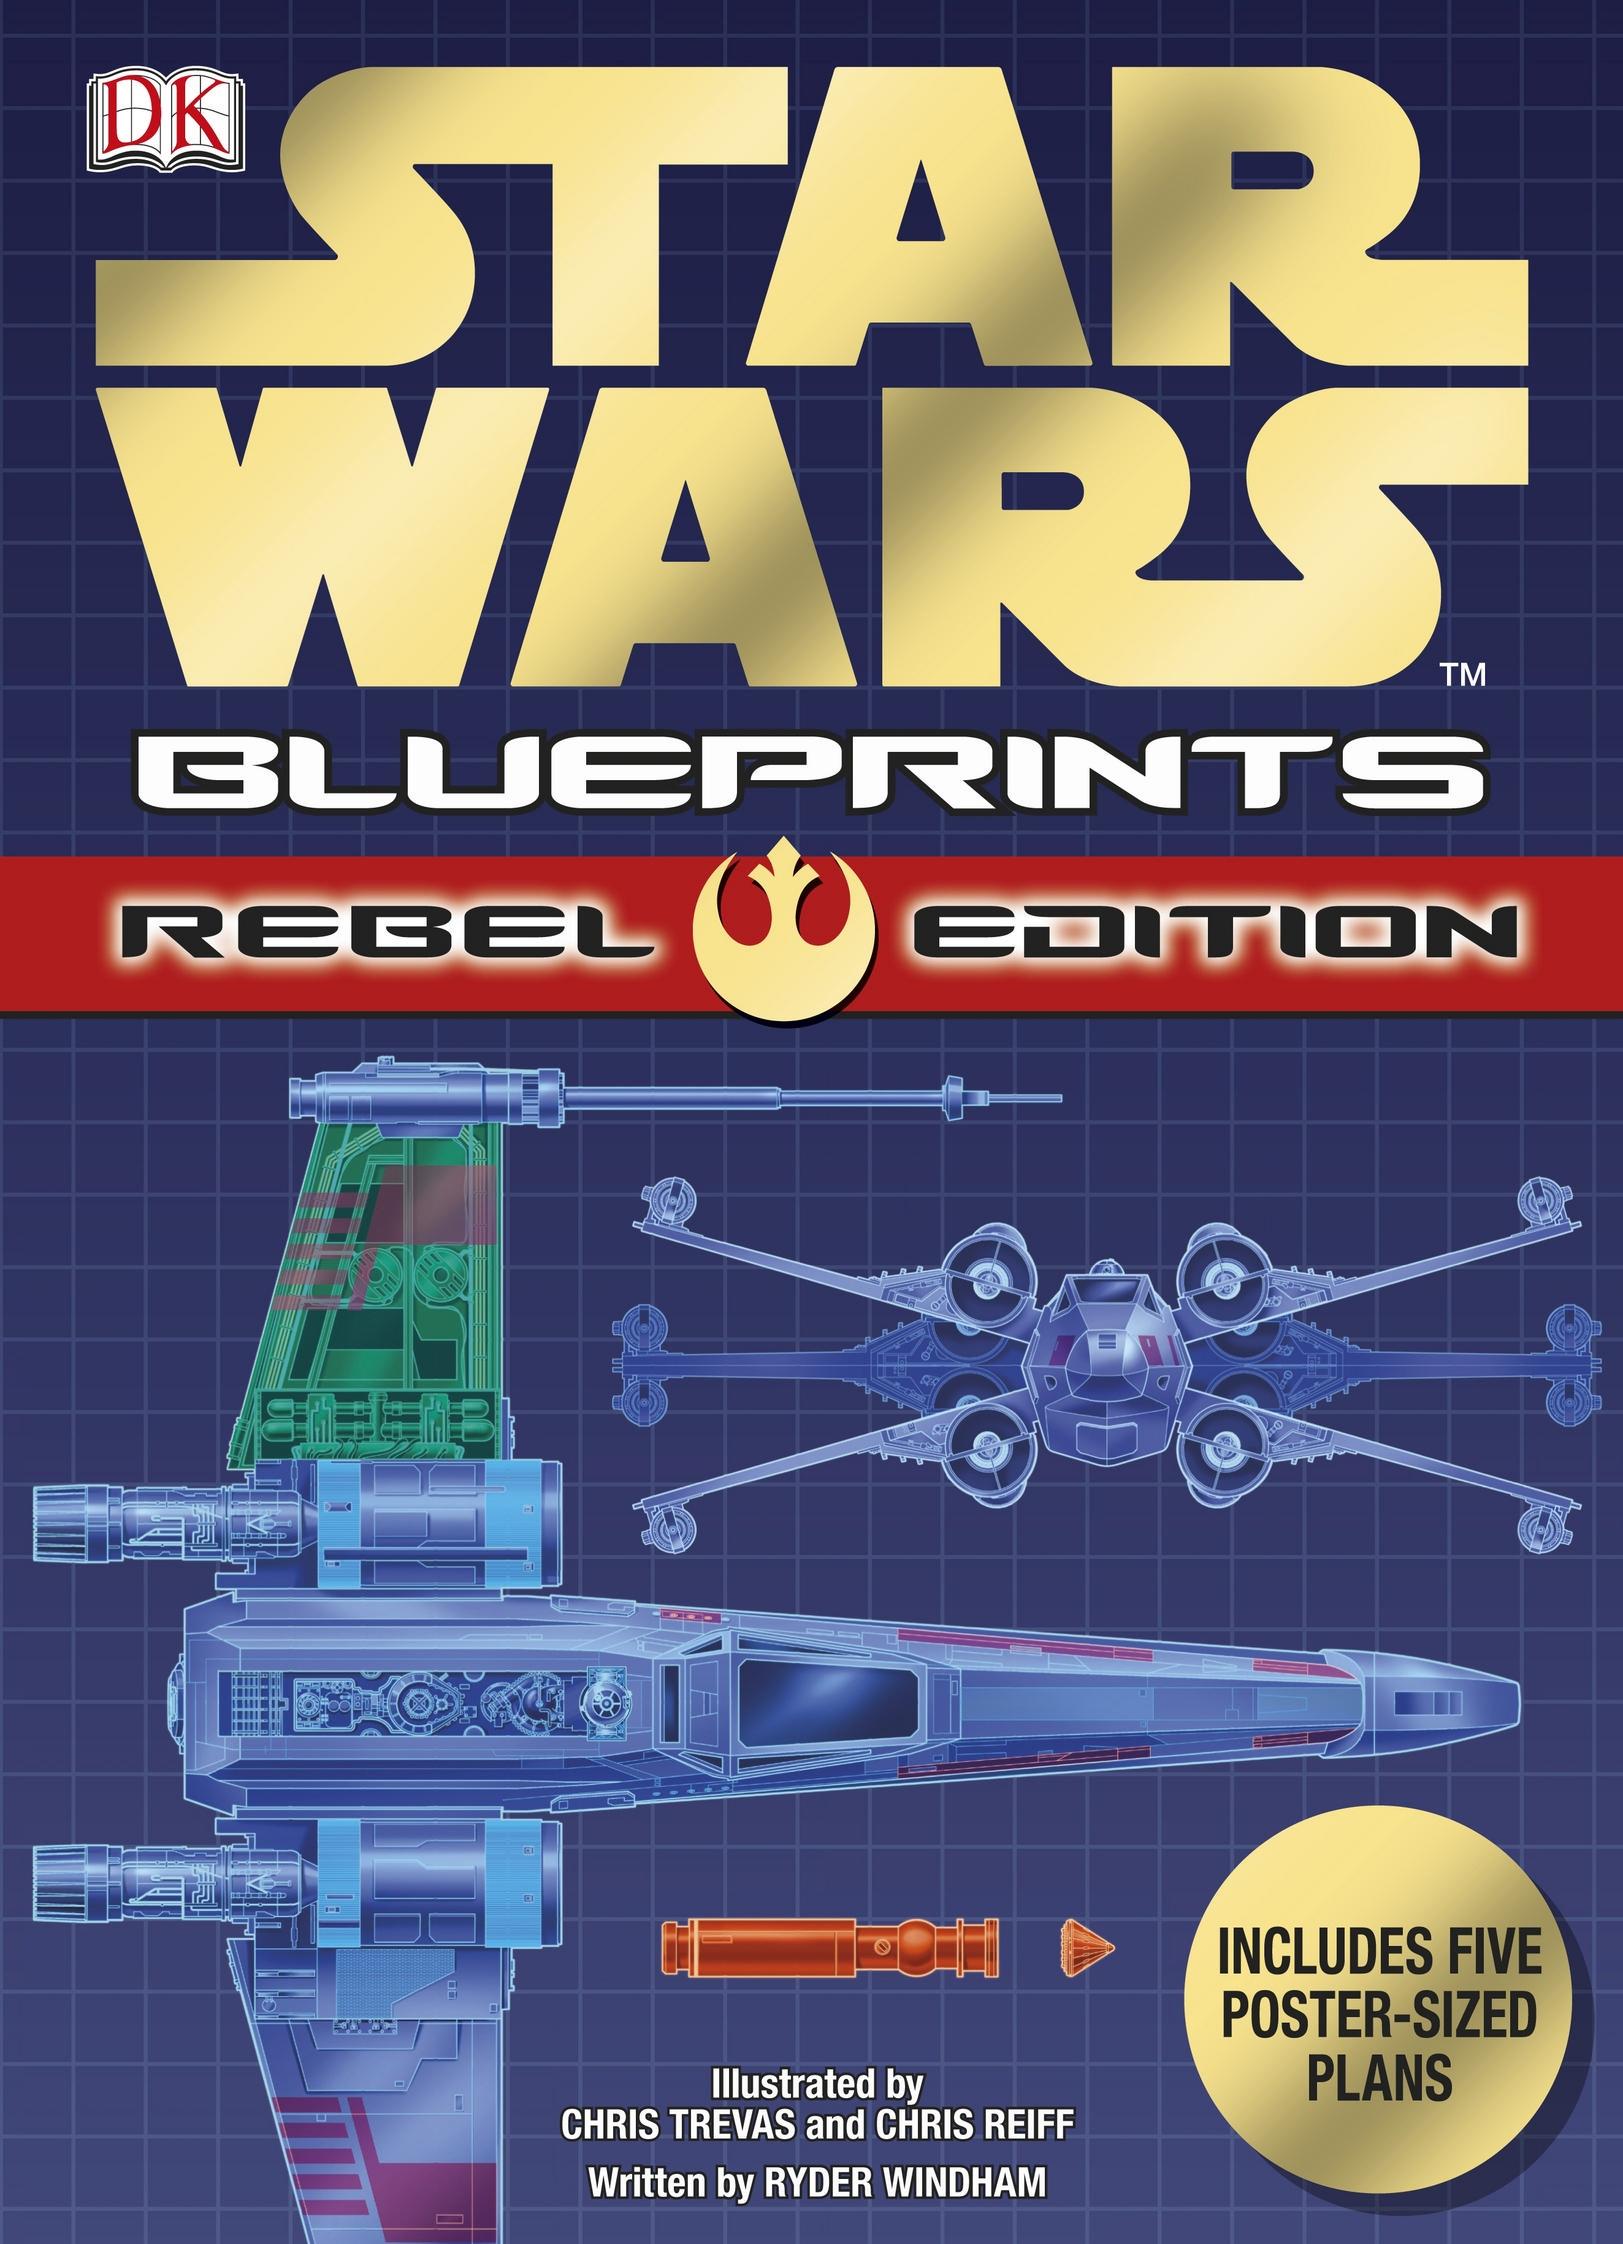 star wars blueprints rebel edition wookieepedia the star wars wiki. Black Bedroom Furniture Sets. Home Design Ideas